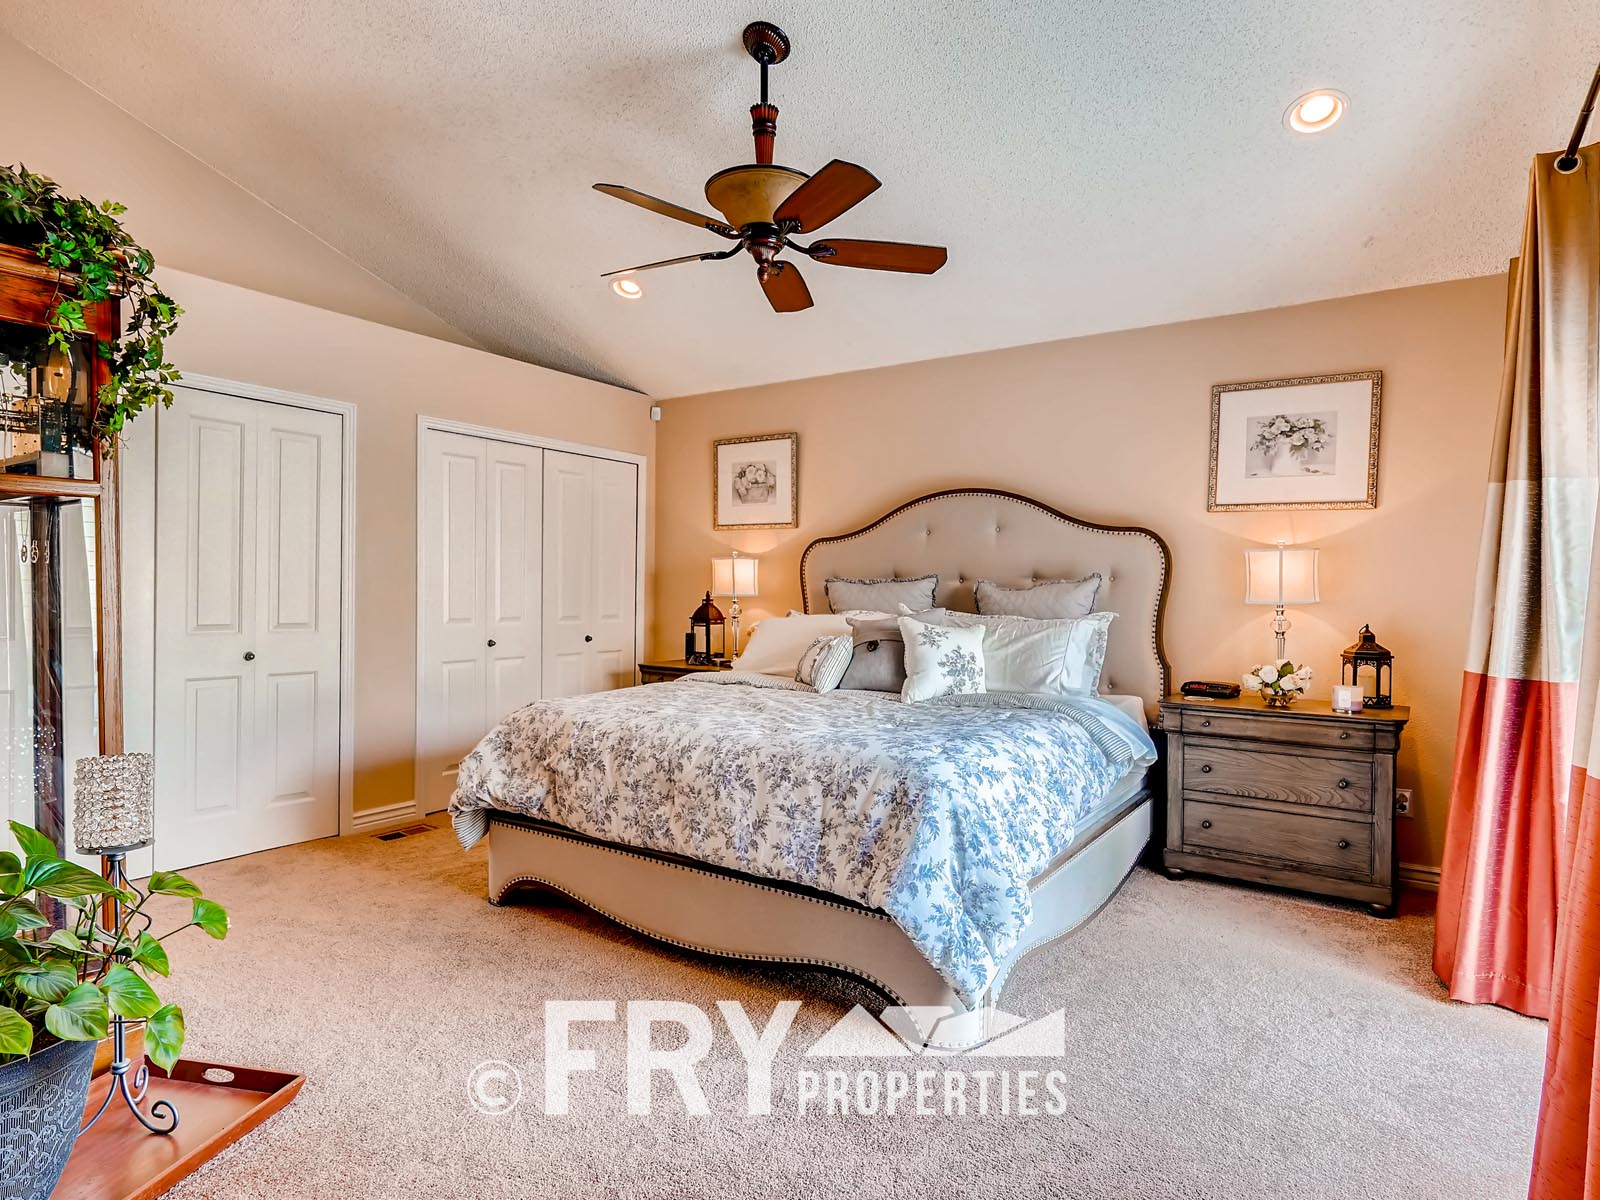 6305 W 6th Ave Unit A6-print-014-9-Master Bedroom-3600x2400-300dpi